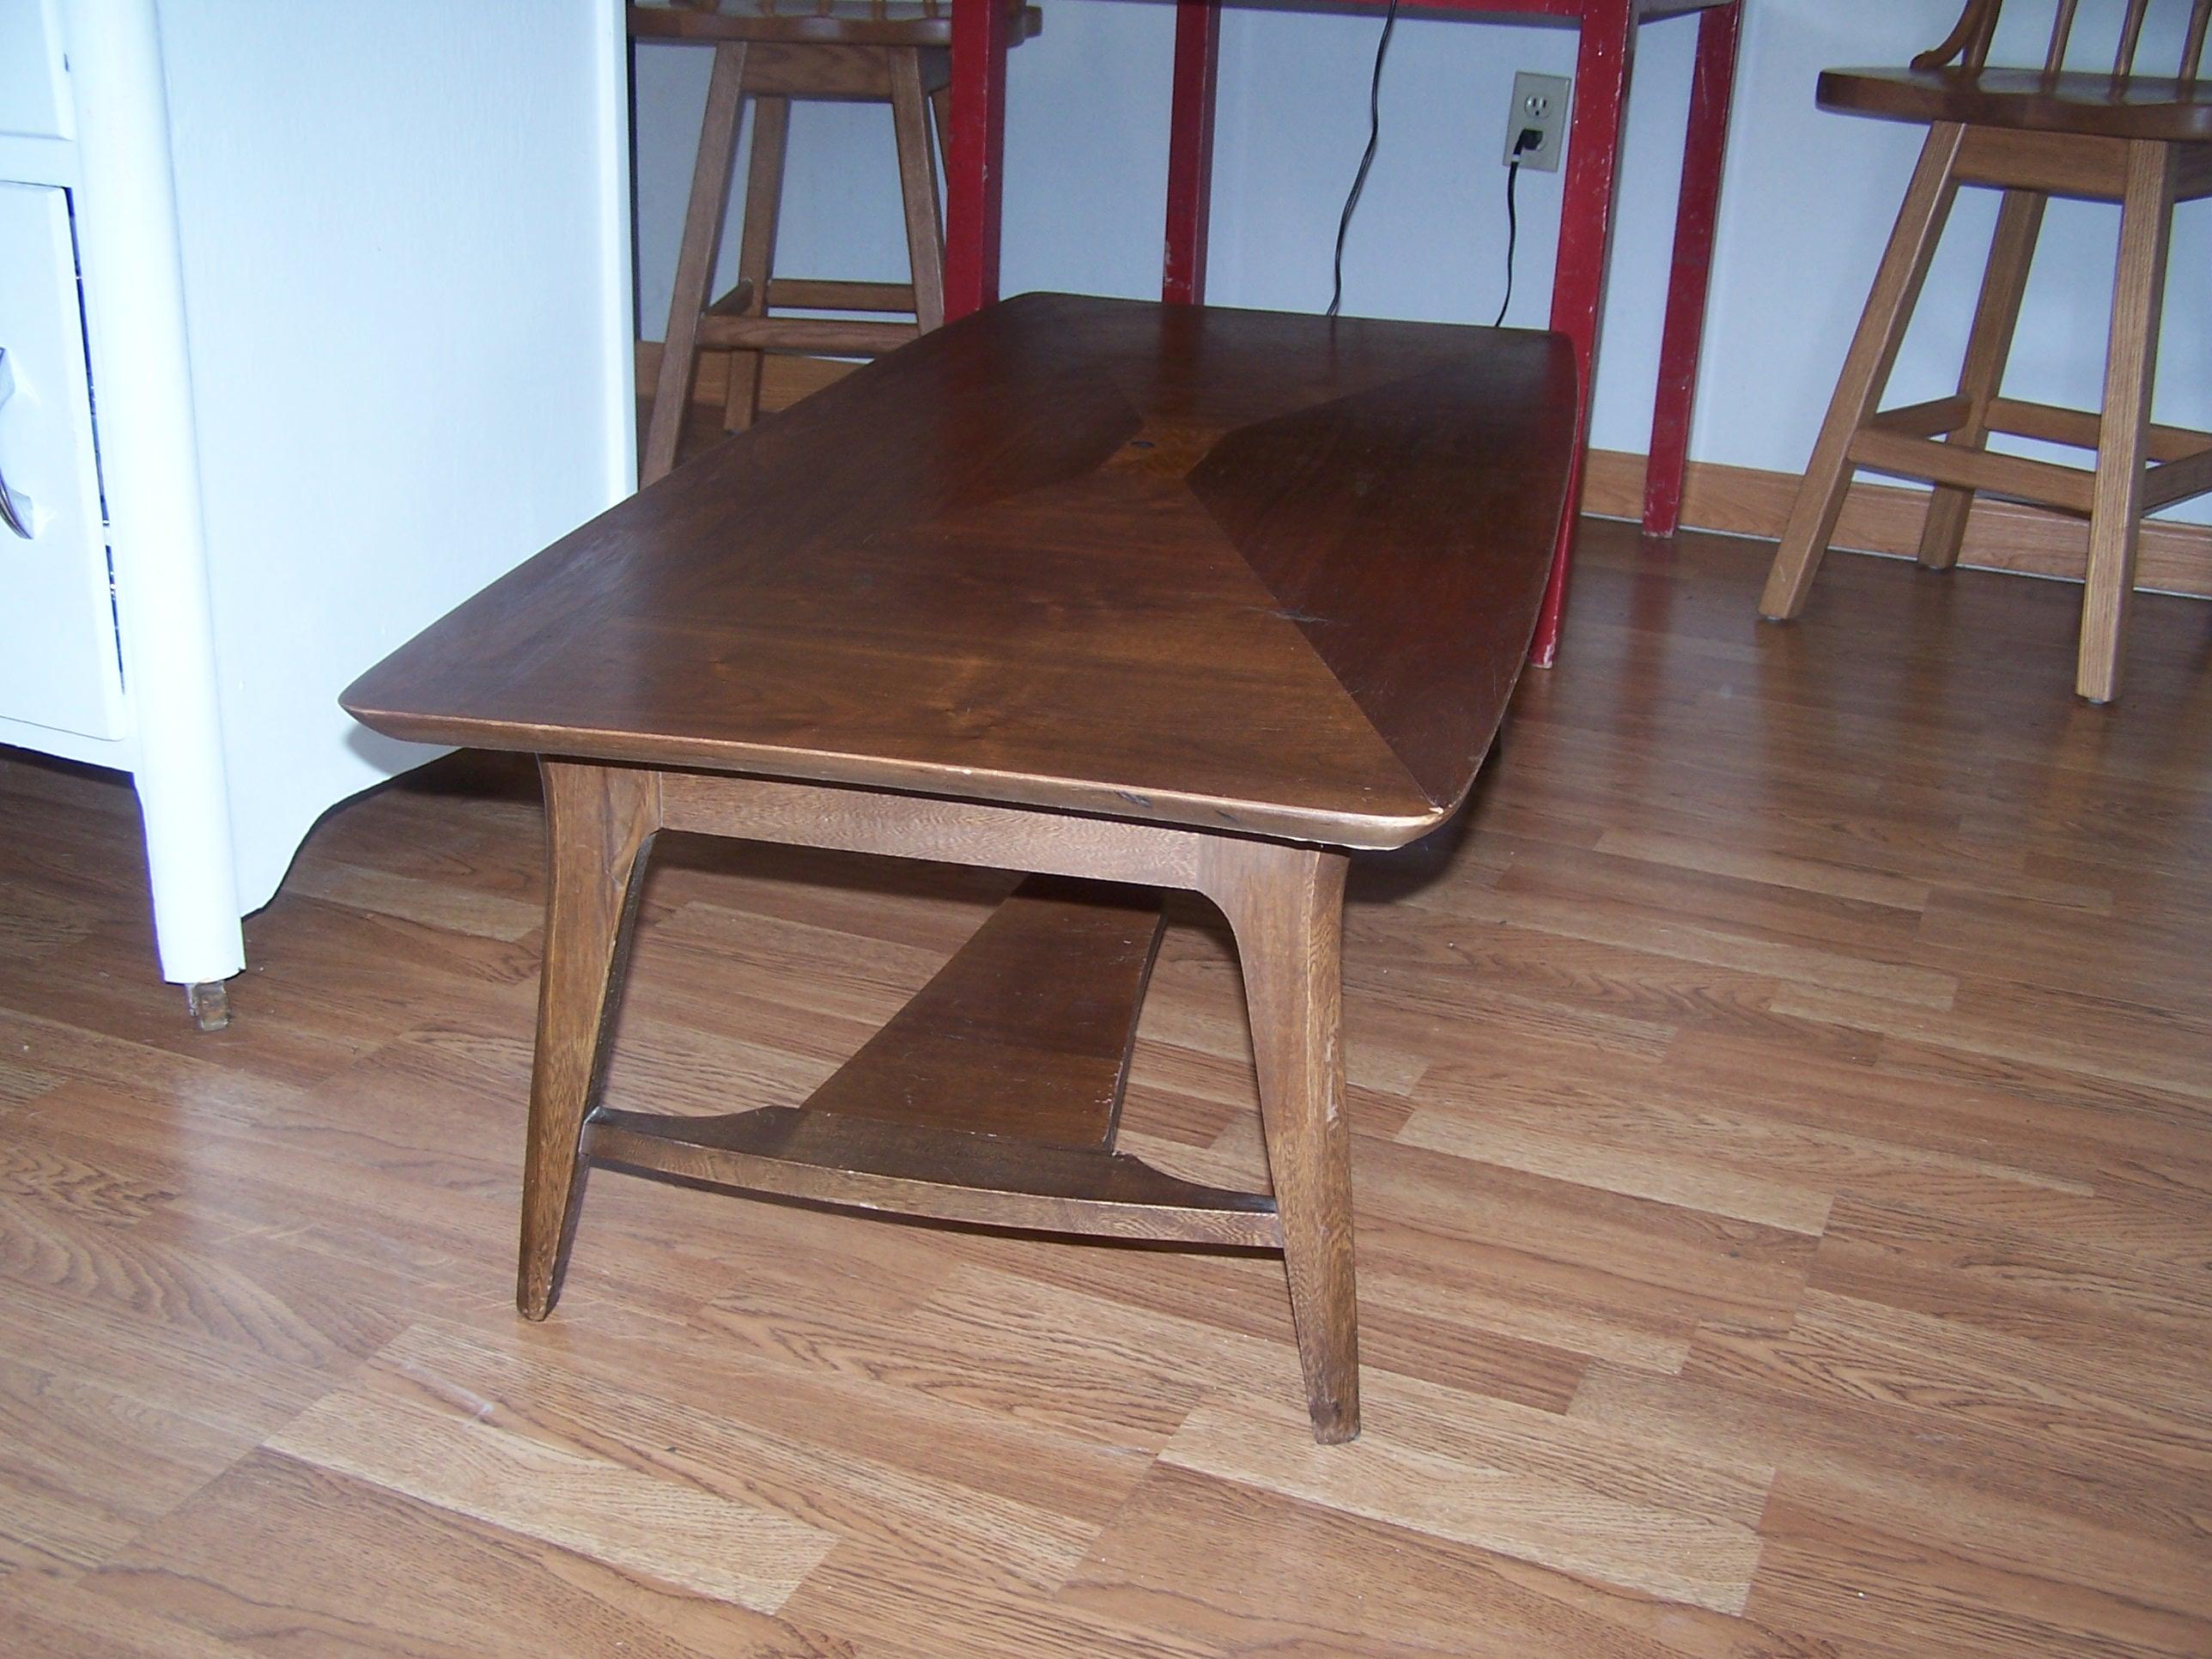 good-coff-table-003